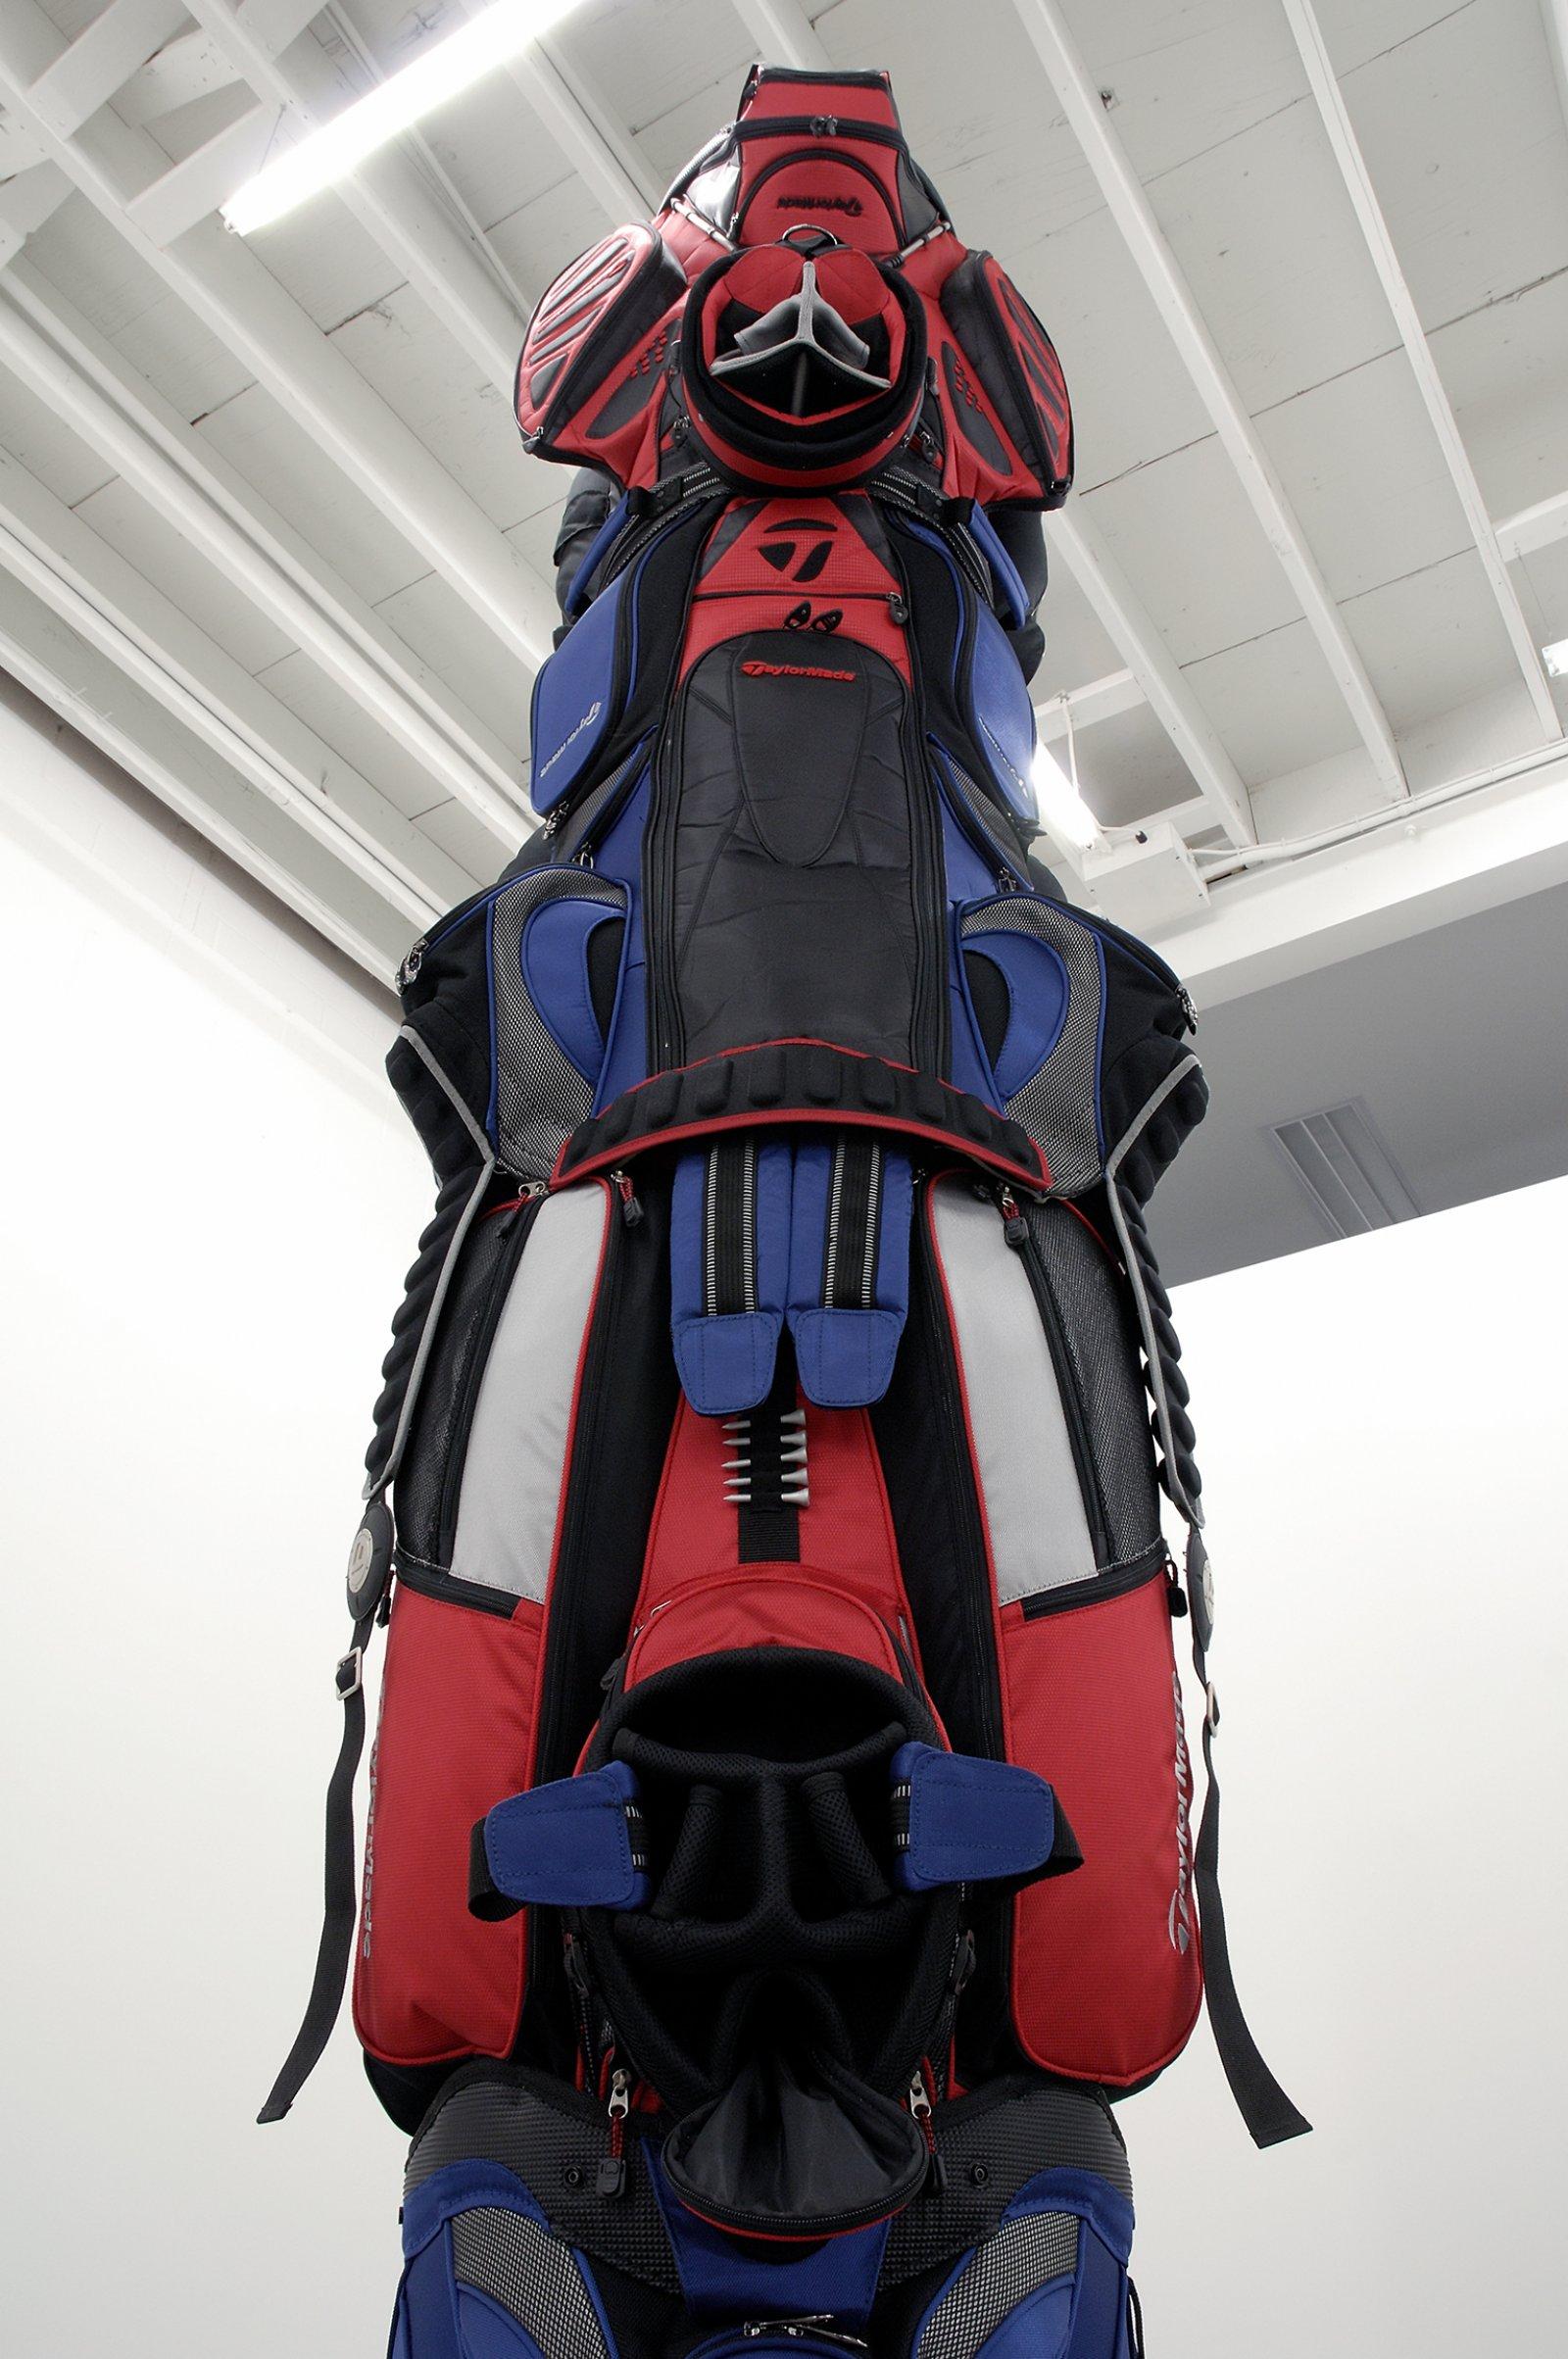 Brian Jungen, 1960 (detail), 2007, golf bags, cardboard tube, 155 x 36 x 48 in. (394 x 91 x 122 cm)   by Brian Jungen